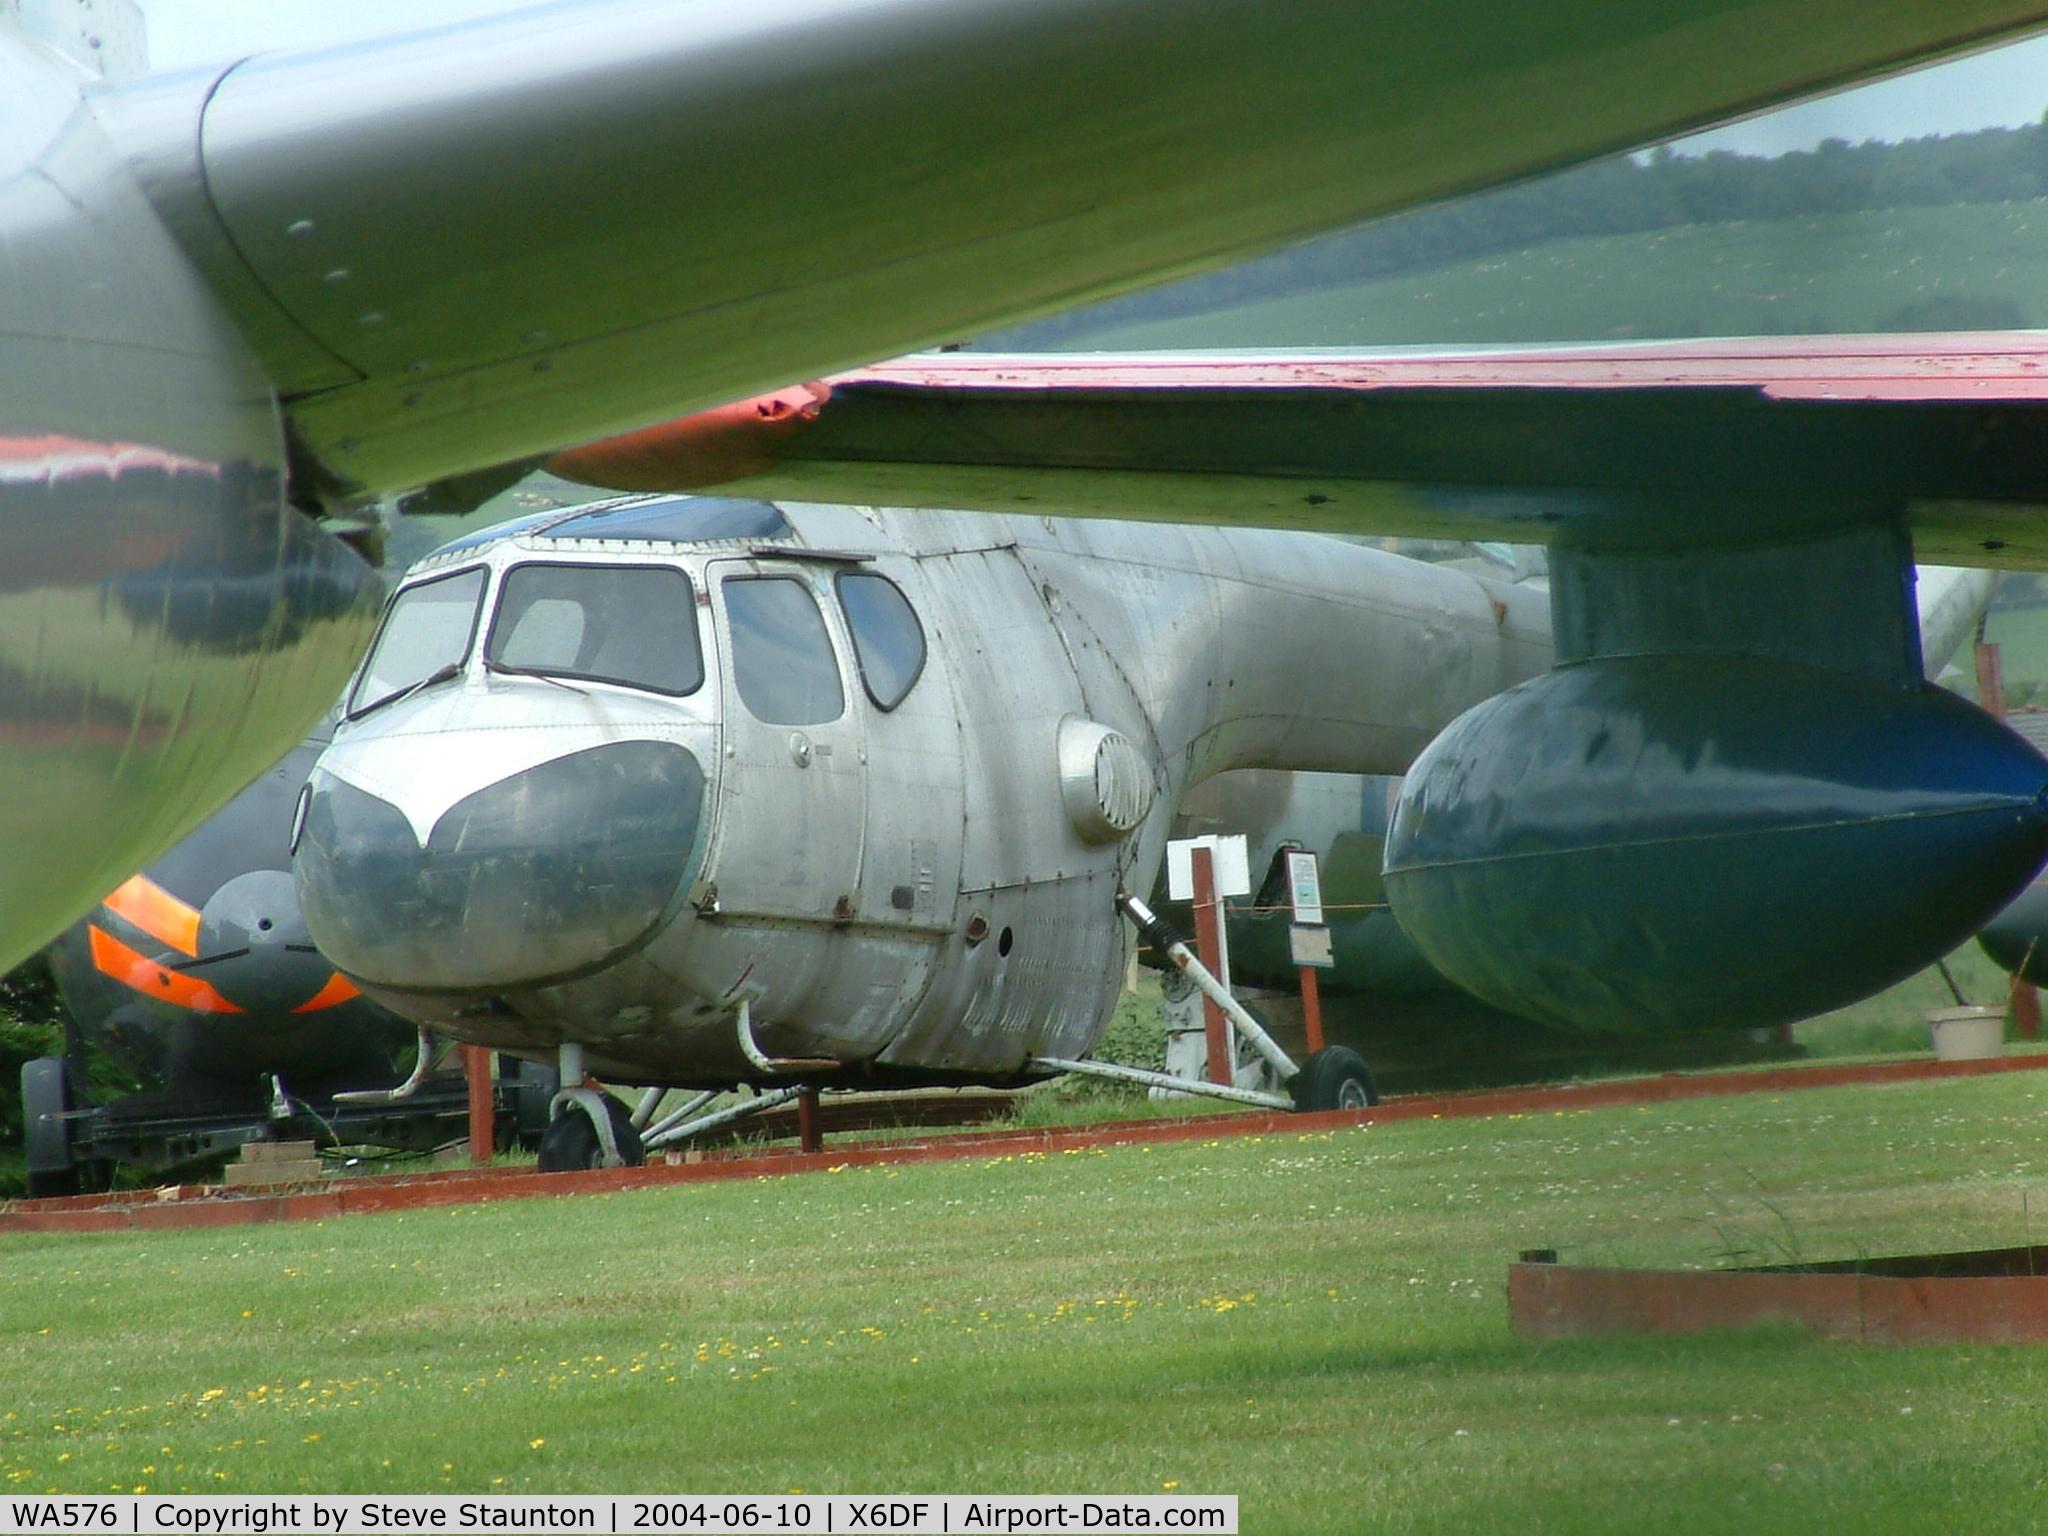 WA576, 1950 Bristol 171 Sycamore Mk.3 C/N 12887, Taken at Dumfries & Galloway Aviation Museum, 10th June 2004